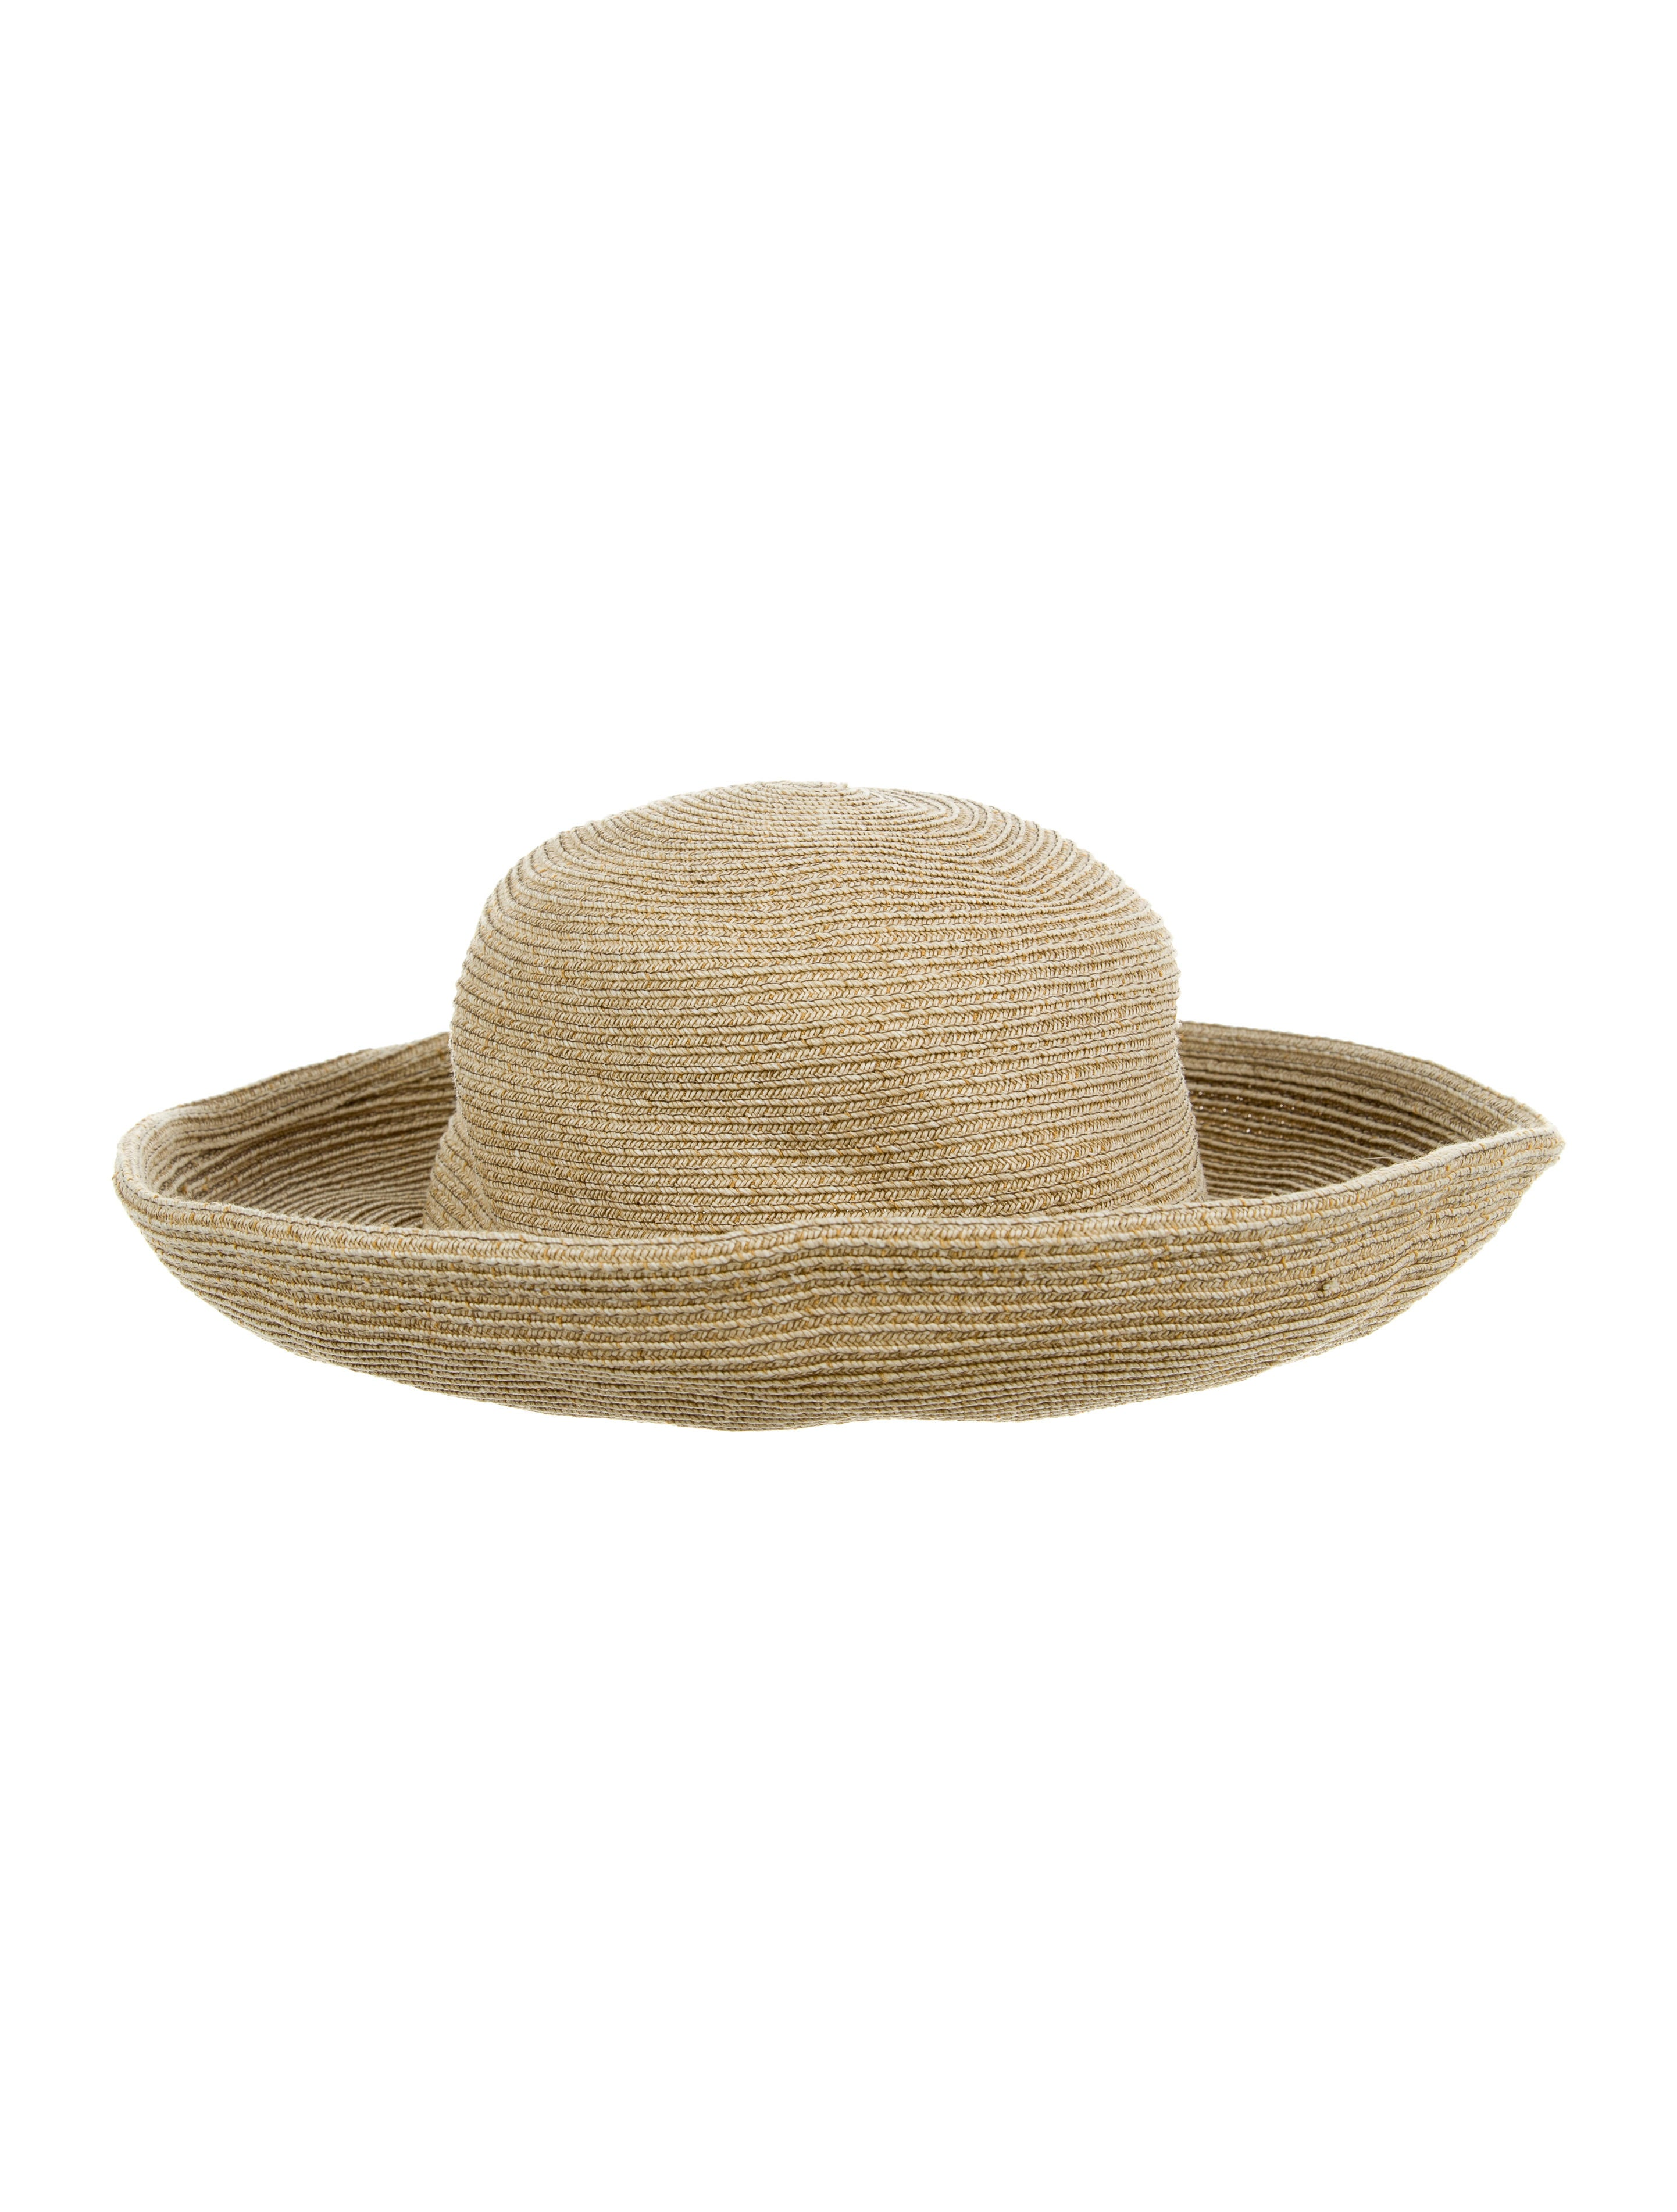 e9af31ea2cb Eric Javits Woven Wide Brim Hat - Accessories - WEJ20112